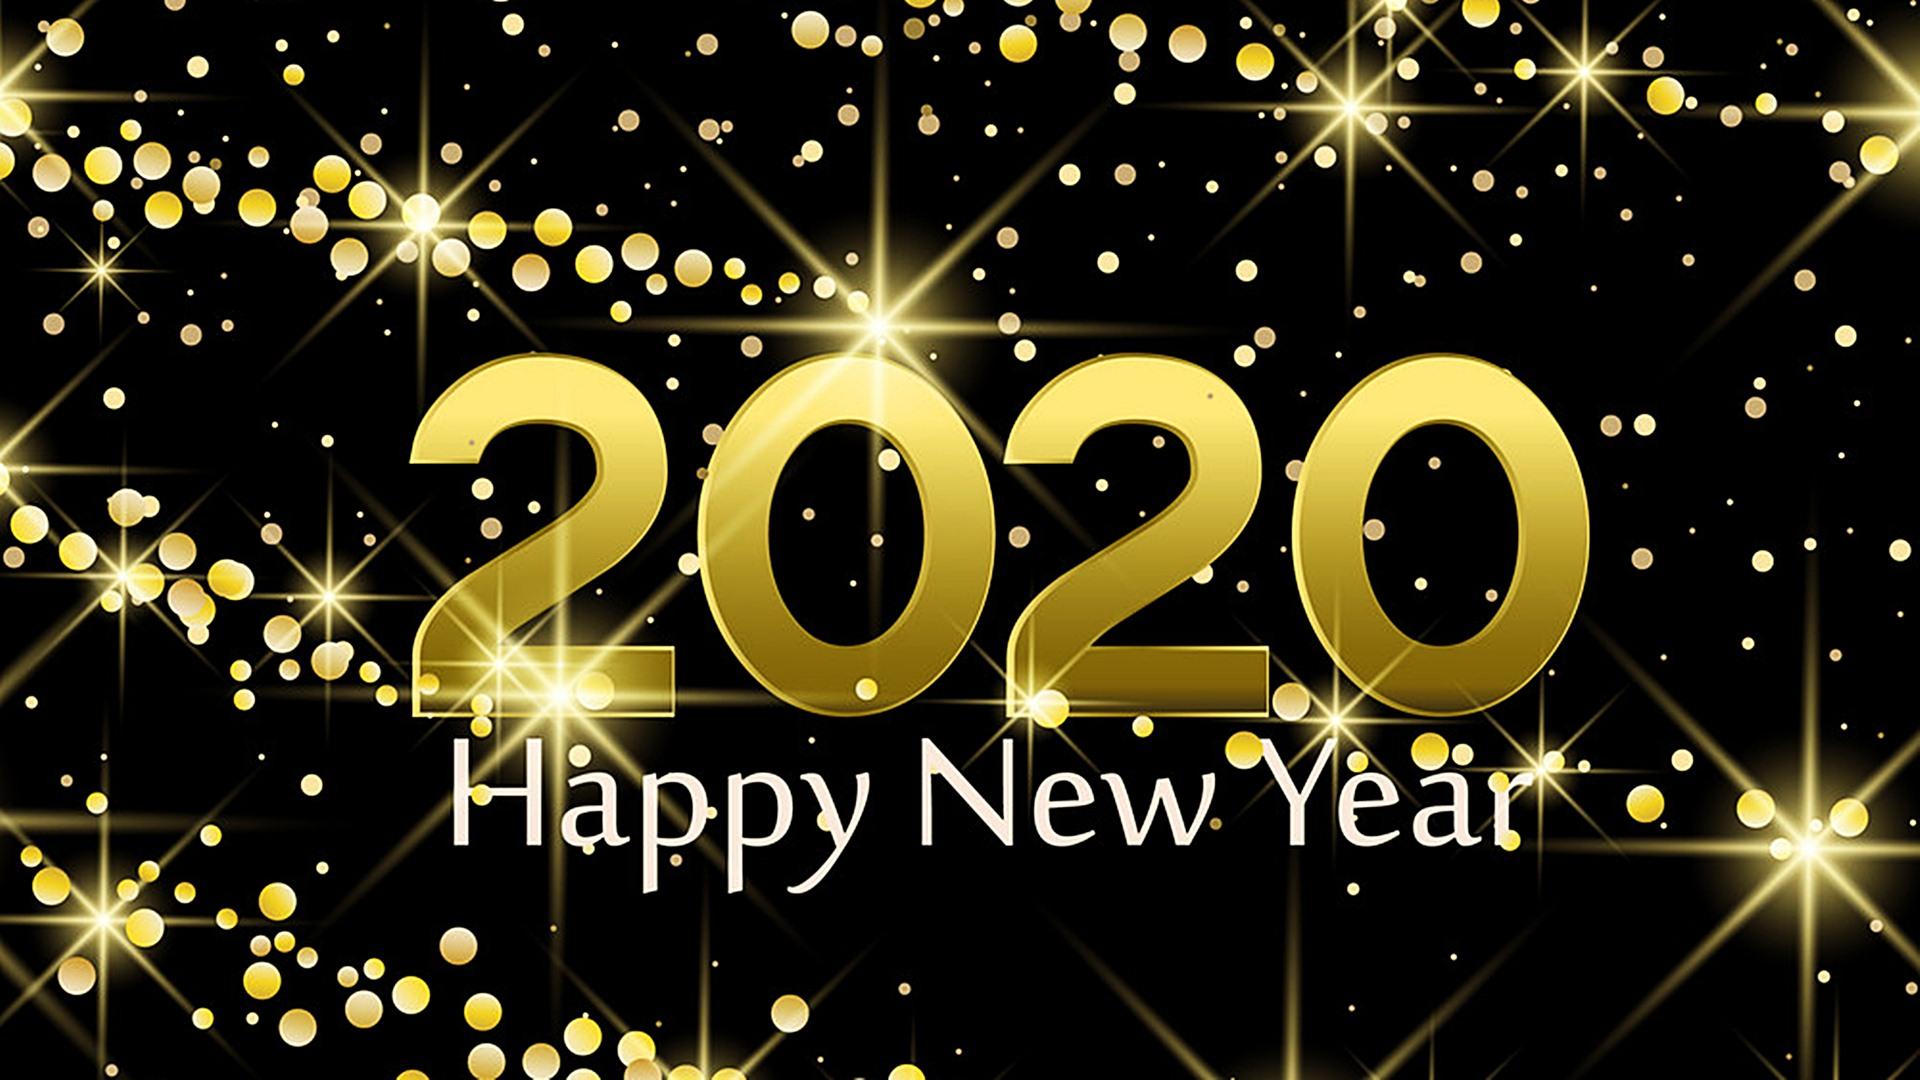 Happy New Year 2020 Desktop HD Wallpaper 45545   Baltana 1920x1080